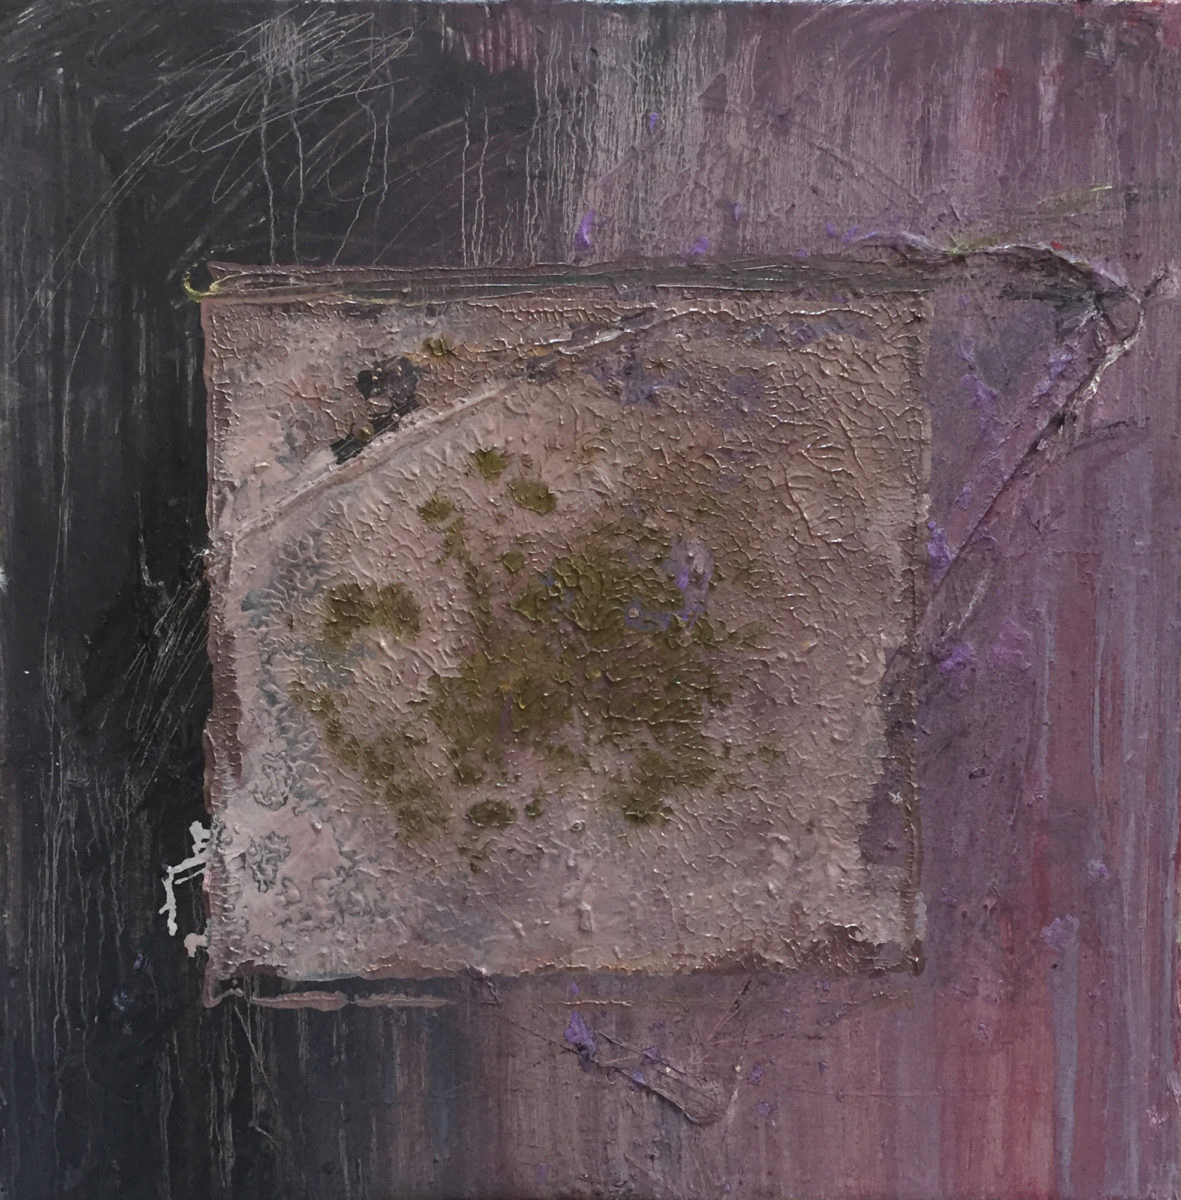 MARC FELD 2017 RHIZOME Huile sur toile 60 x 60 cm